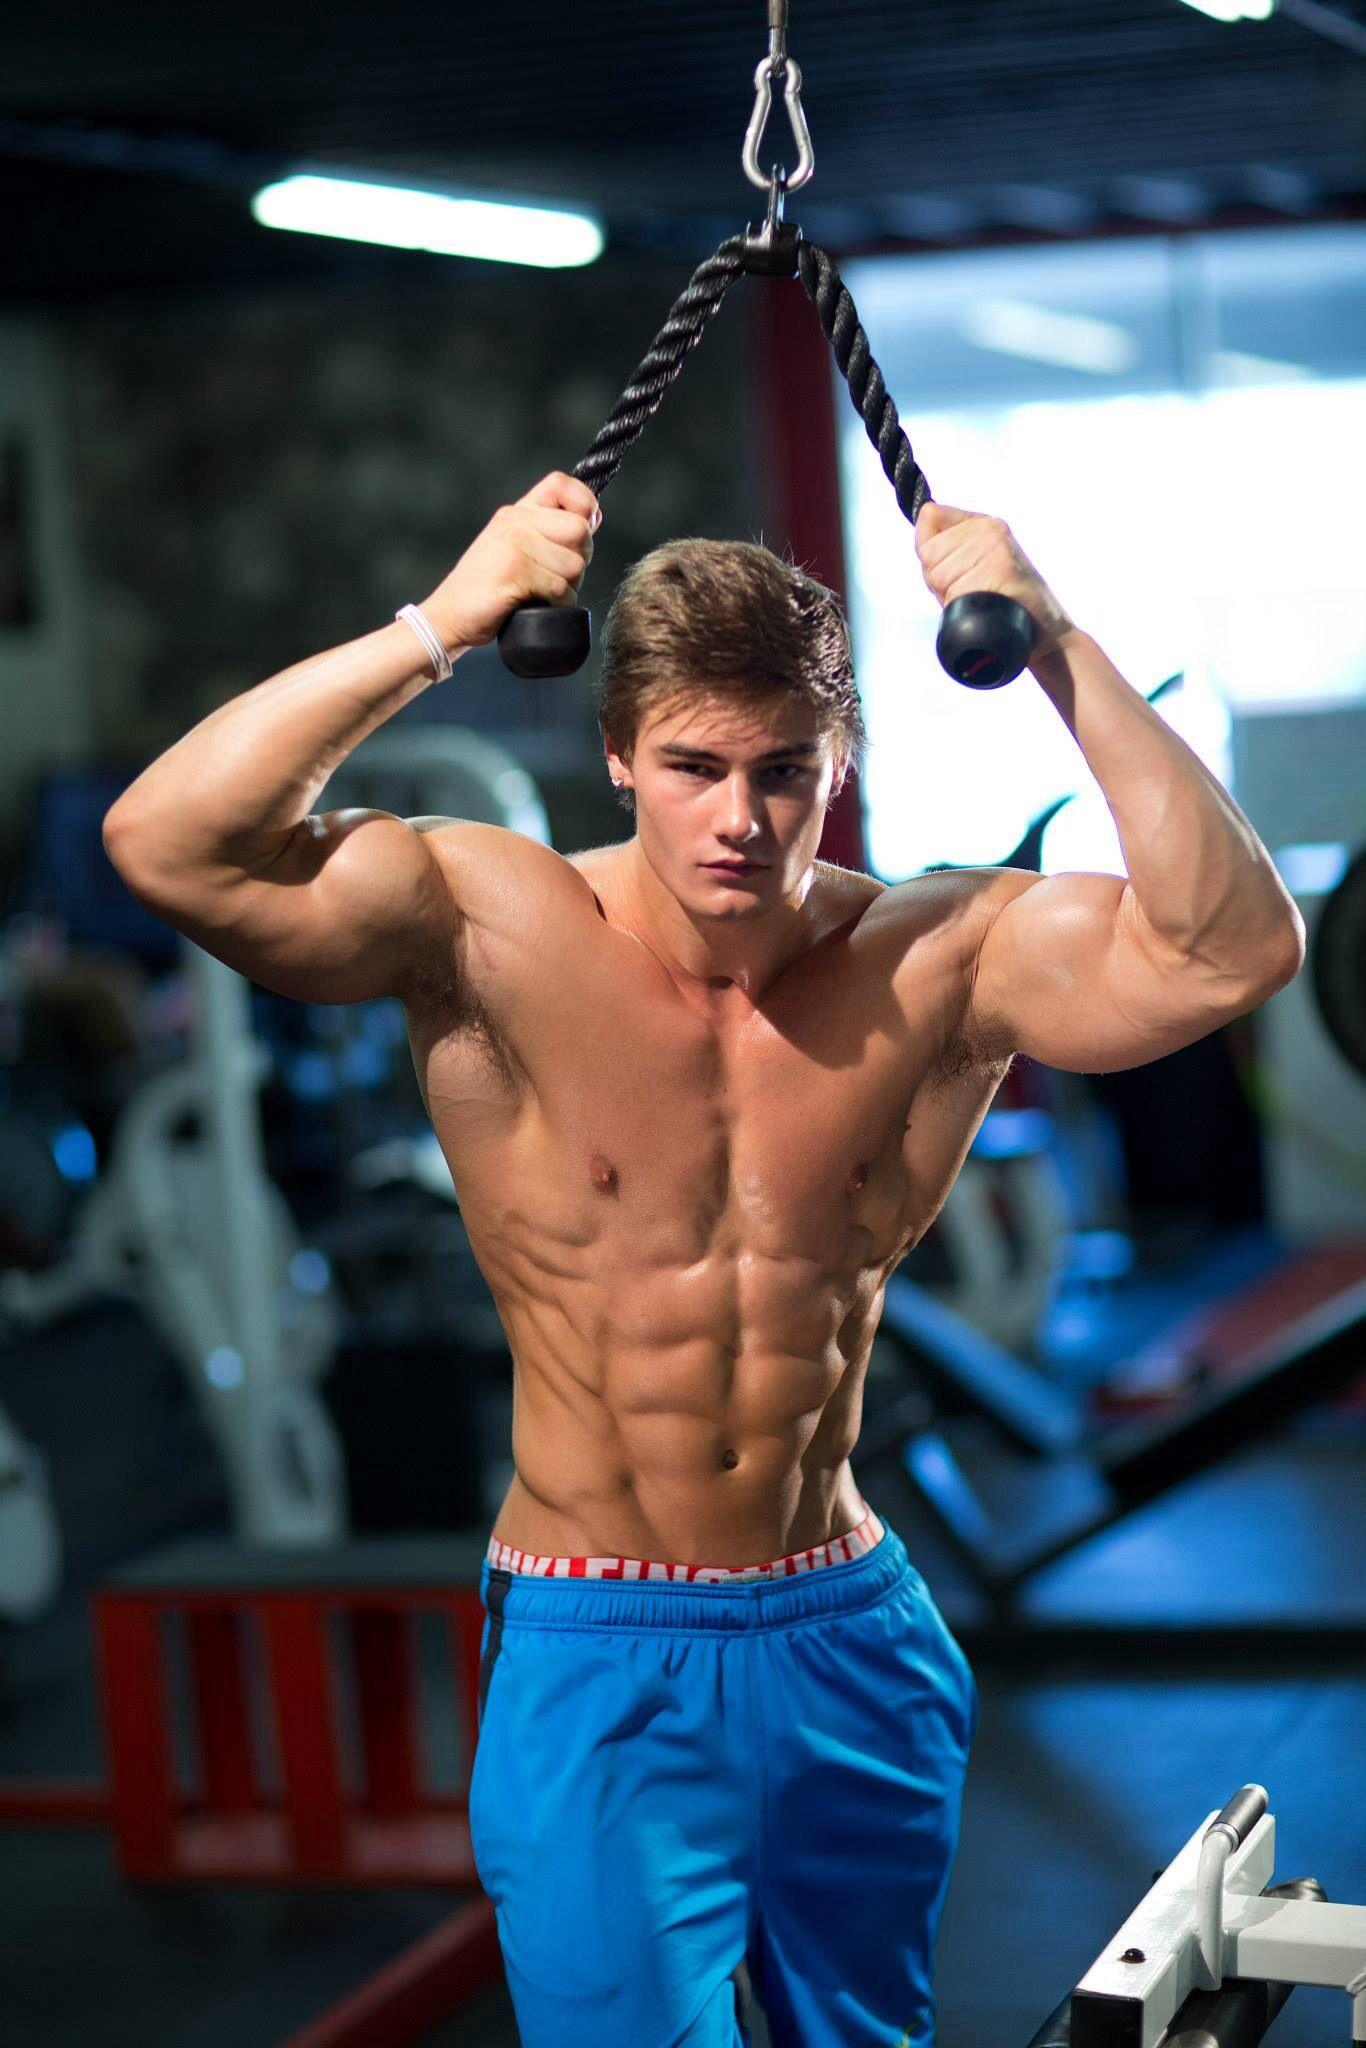 Sexy Strong Bodybuilder